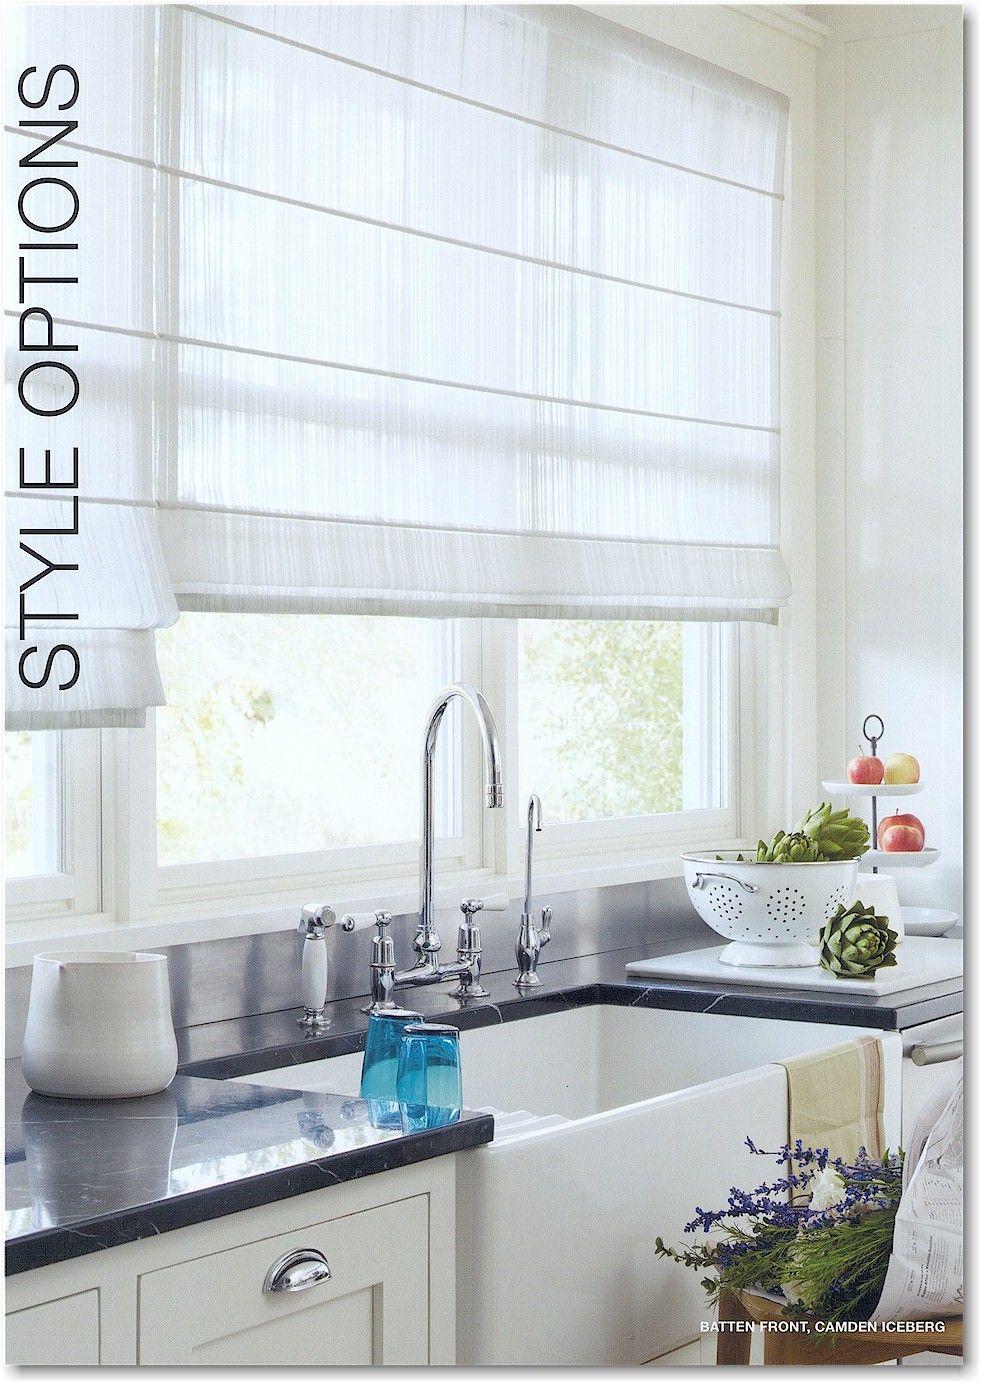 Hunter douglas design studio roman shades in sheer fabric for Fabric shades for kitchen windows